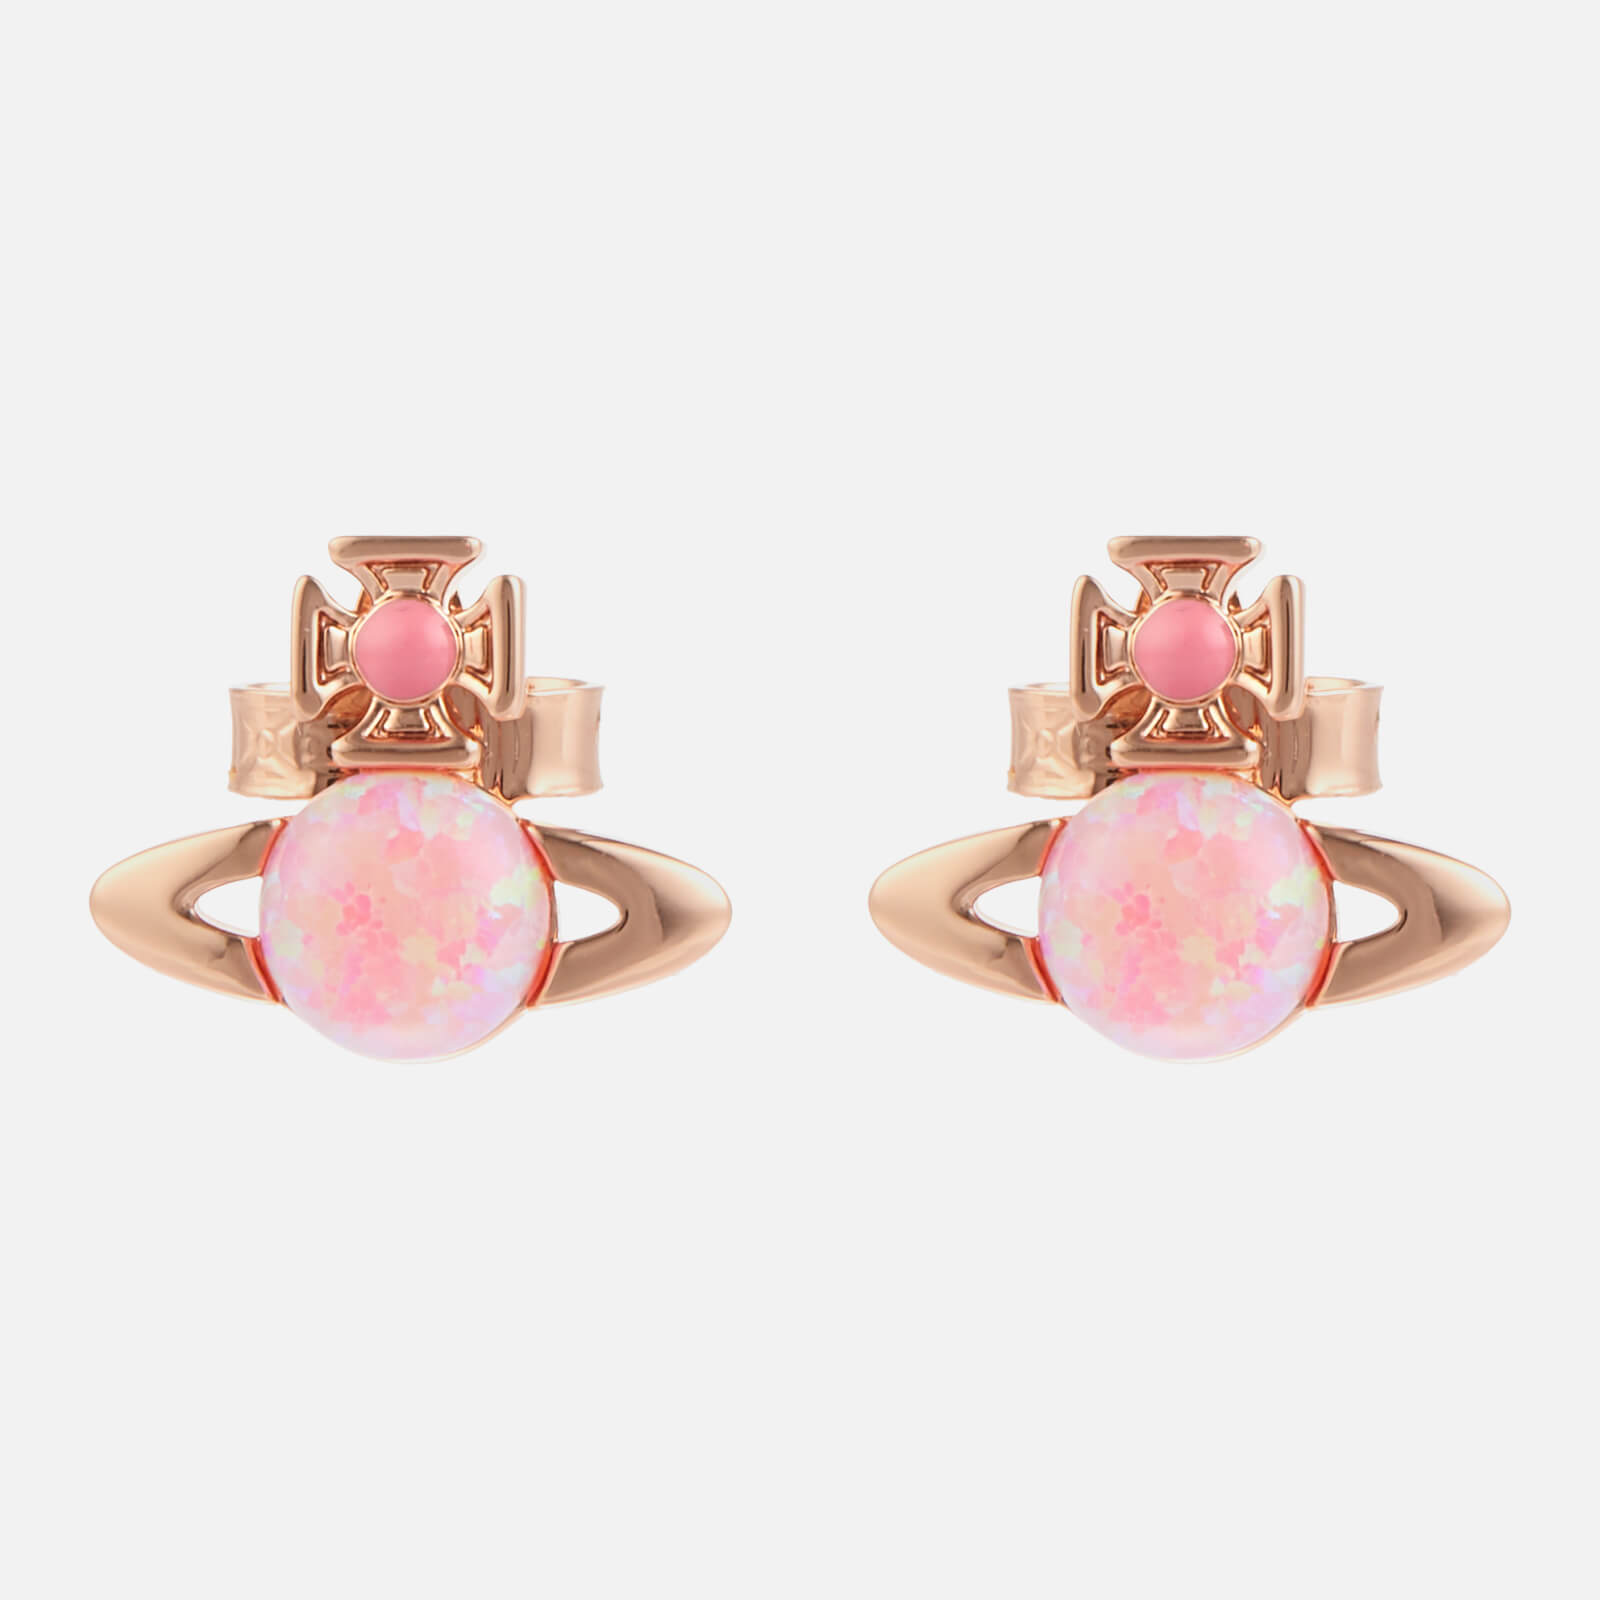 Vivienne Westwood Women's Isabelitta Bas Relief Earrings - Pink Gold Pink Pink